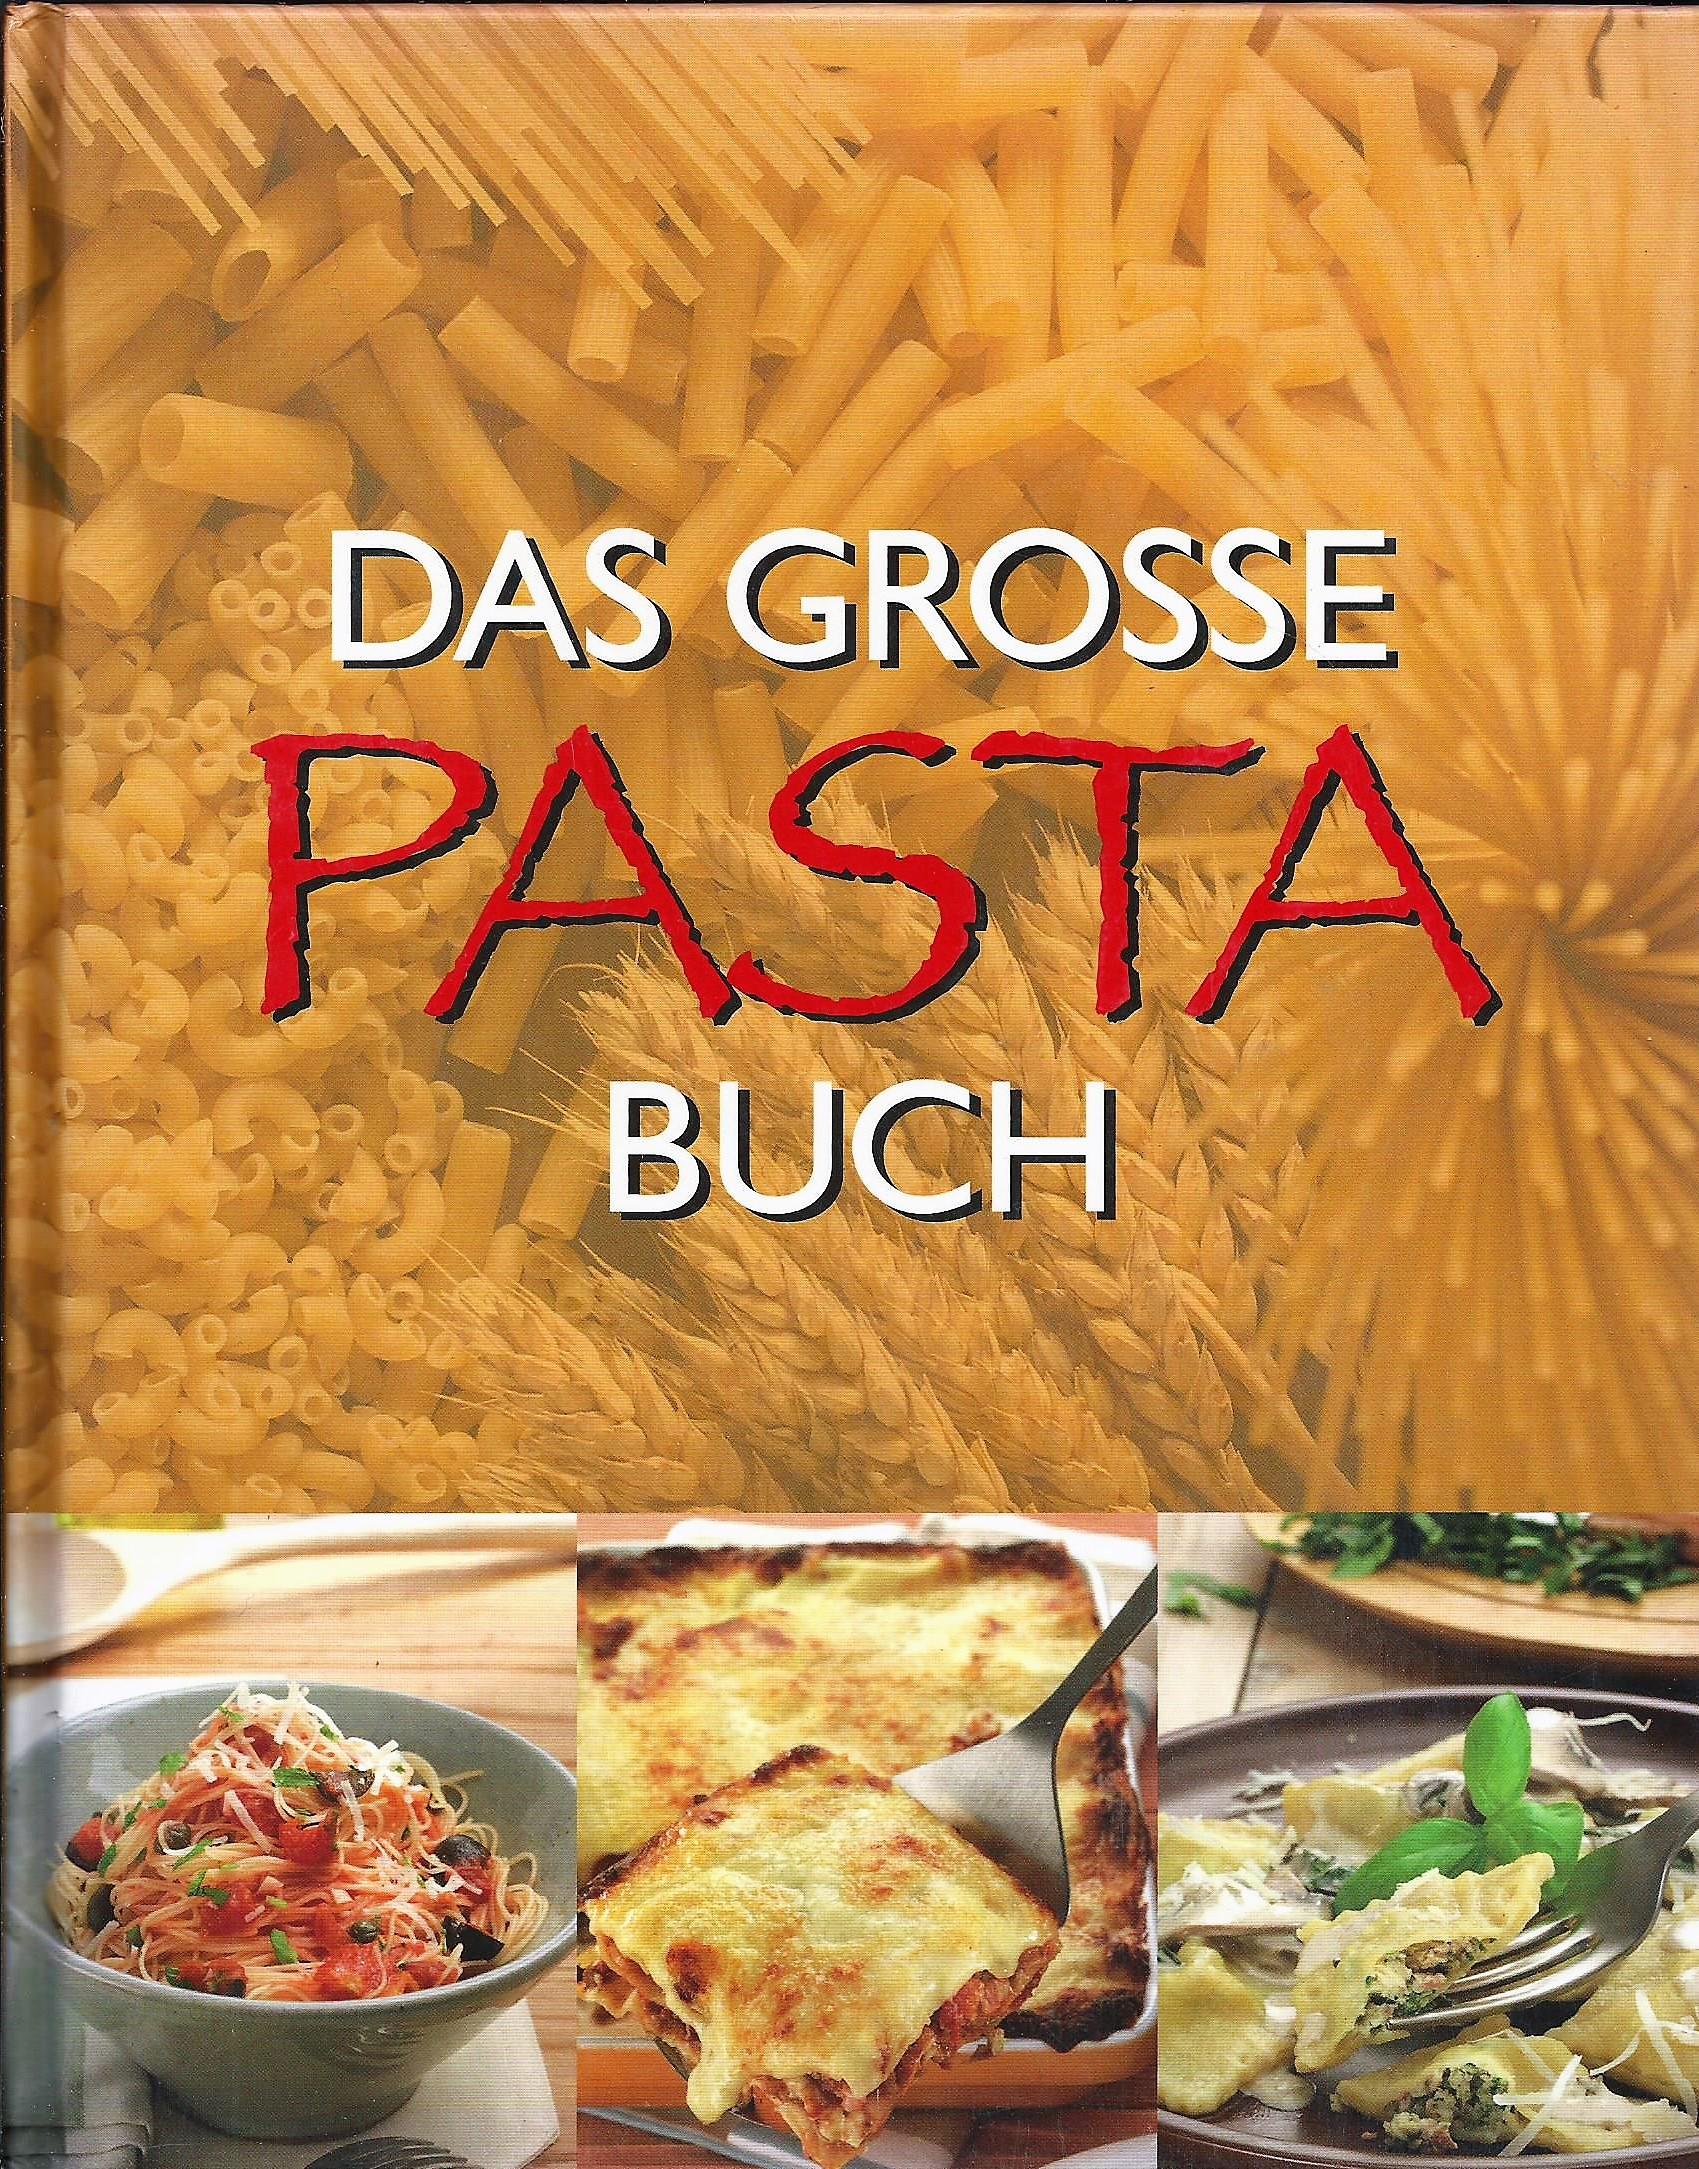 Das große Pastabuch (Pasta-Buch) - France, Christine (Einleitung/Rezepte); Levy, Simon (Layout); Drake, Angela; Goldfinch, Teresa (Foodstyling)